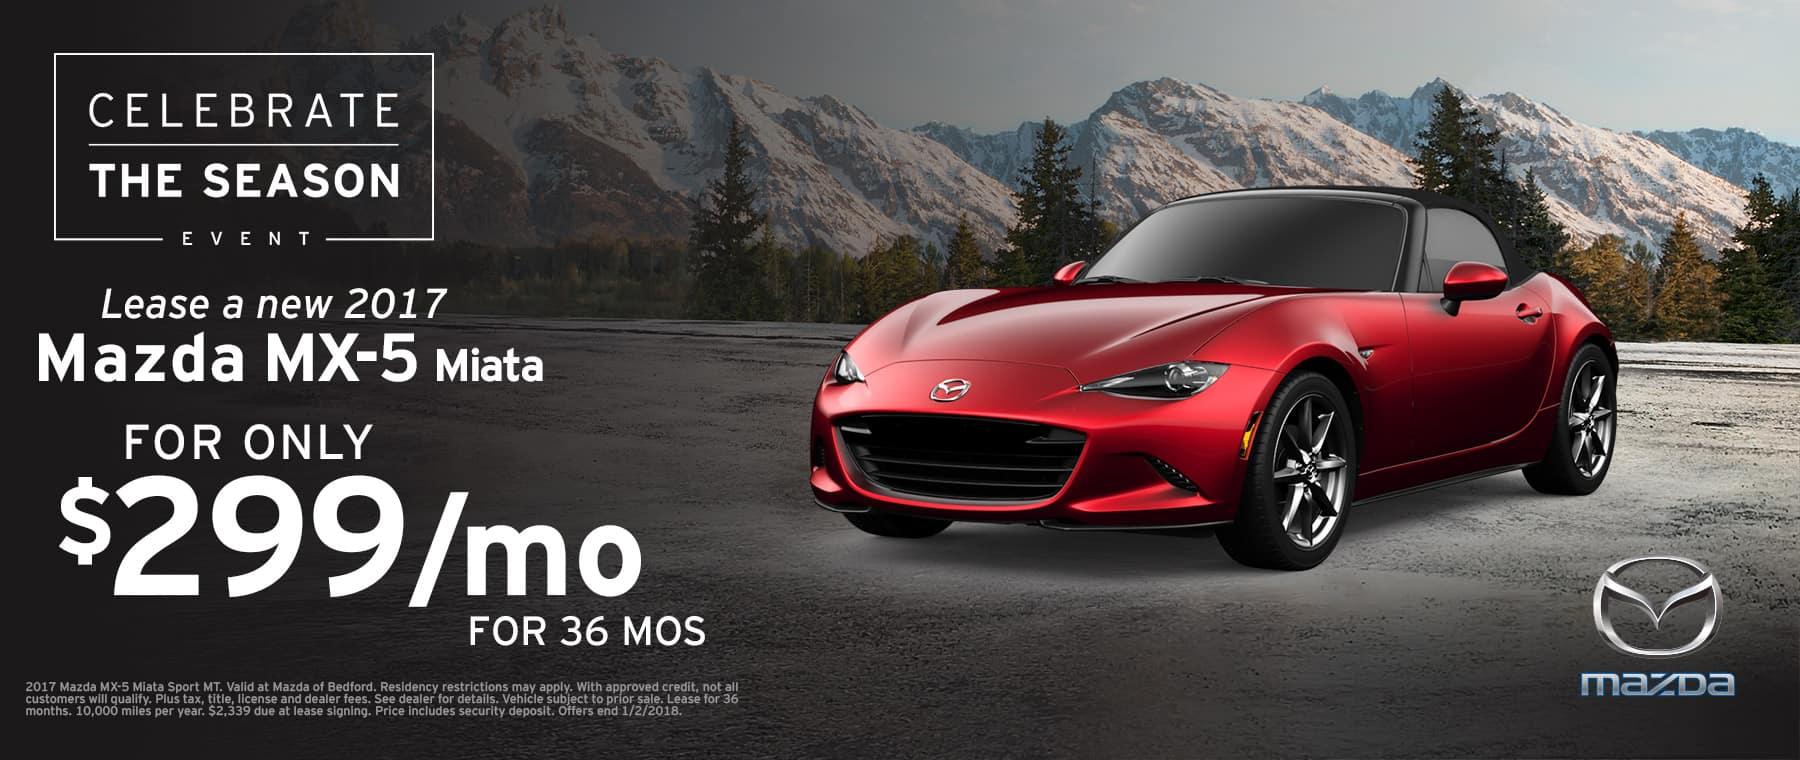 2017 Mazda MX-5 Miata Lease Offer